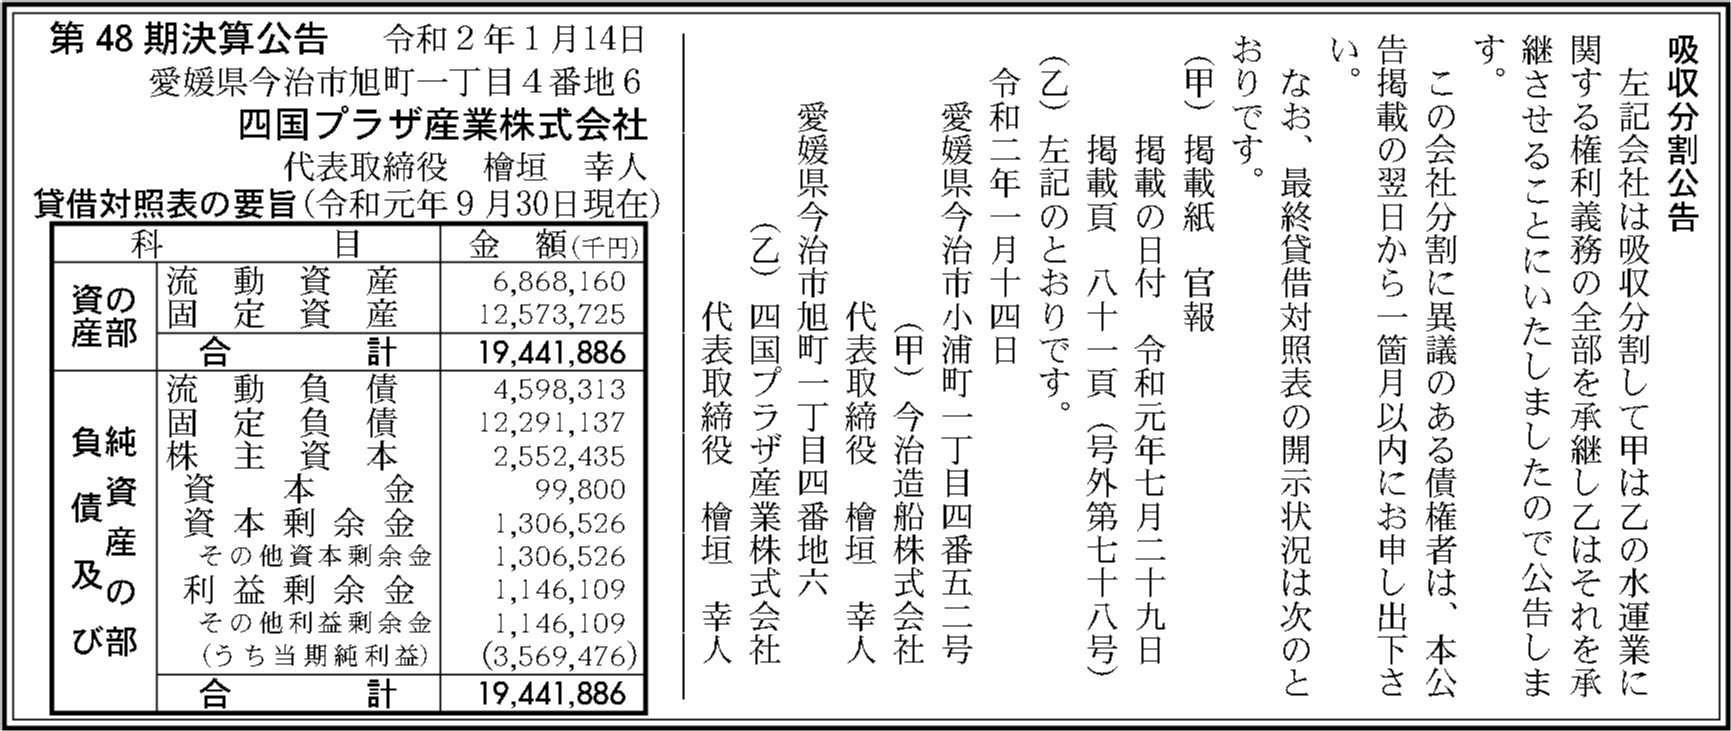 0059 edb532a5aae23657dd12b16d9c6db0509618142cb319e8d786b863d718c0c63382a52d8ad5cce264c7c58ca99f935ac5d3d5004c39b47fcd4119d26006d689ae 06